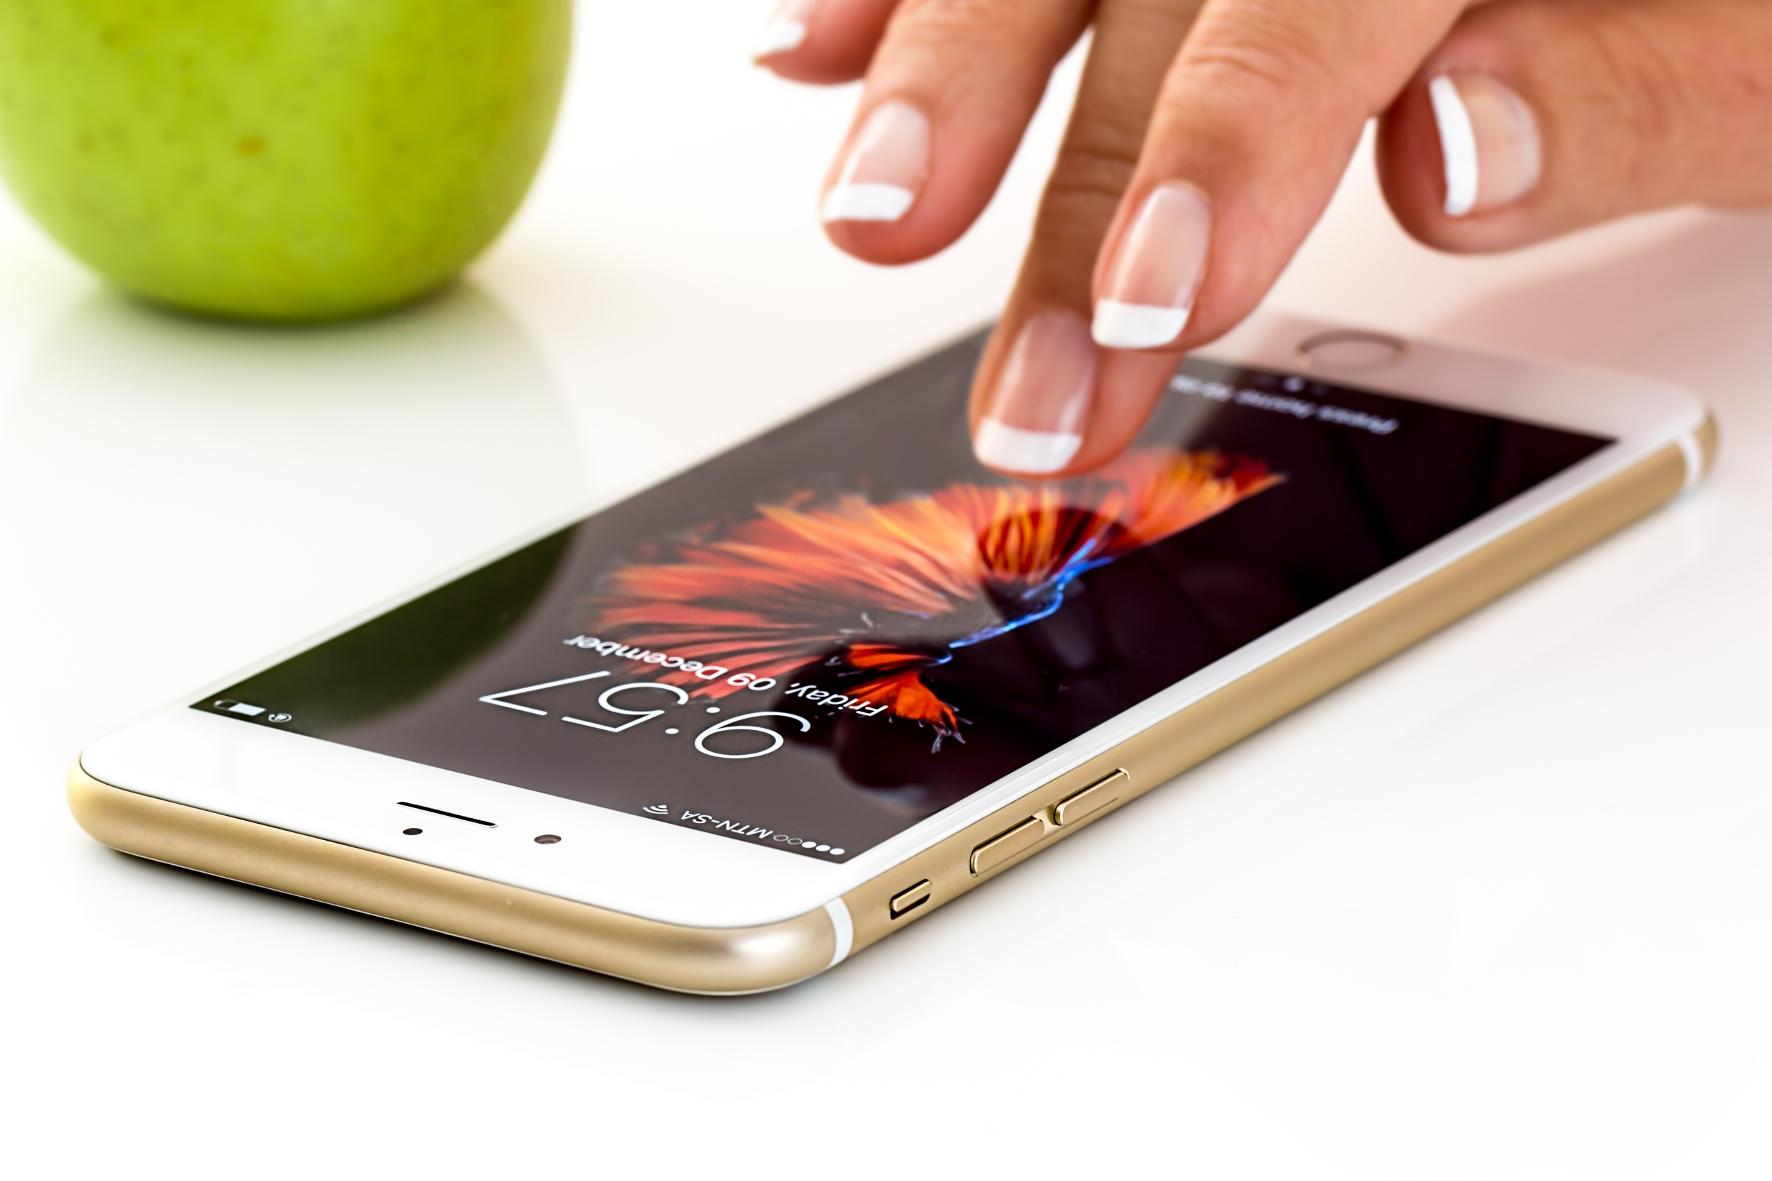 mid Groß-Gerau - Das iPhone ersetzt bei Apple Pay das Portemonnaie. stevepb / pixabay.com